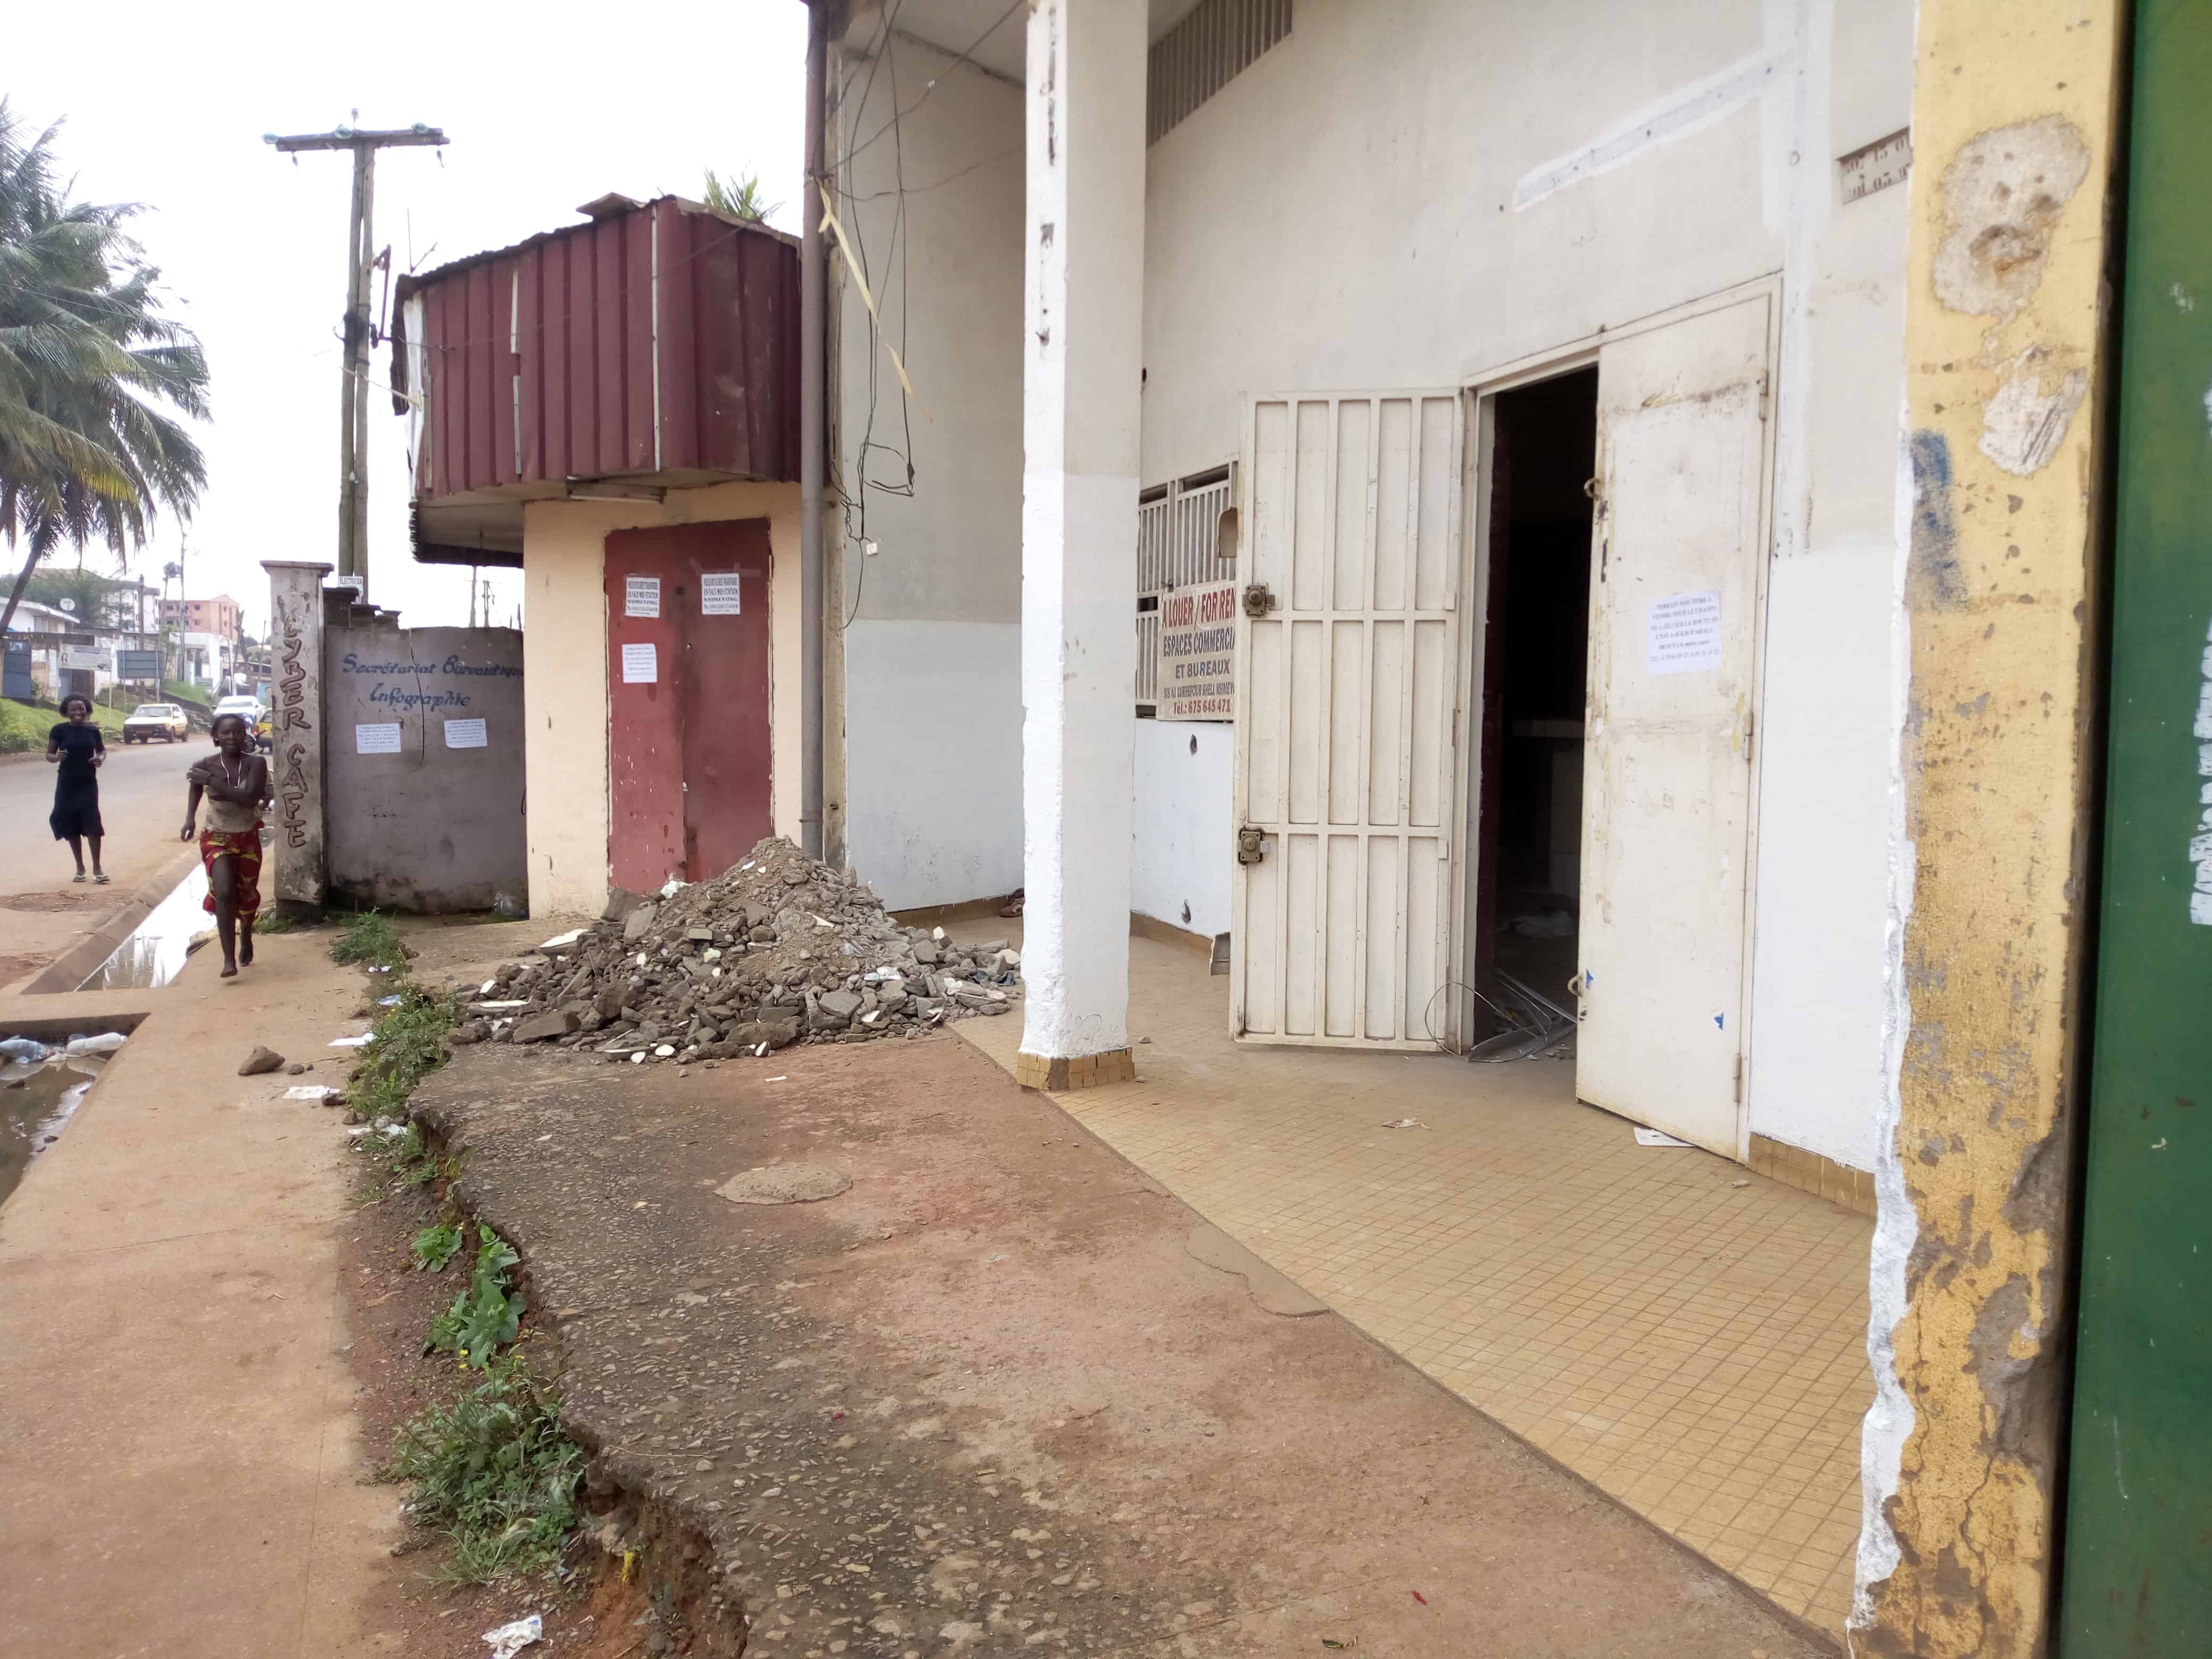 Shop to rent at Yaoundé, Biyem-Assi, immobilier - 100 m2 - 350 000 FCFA